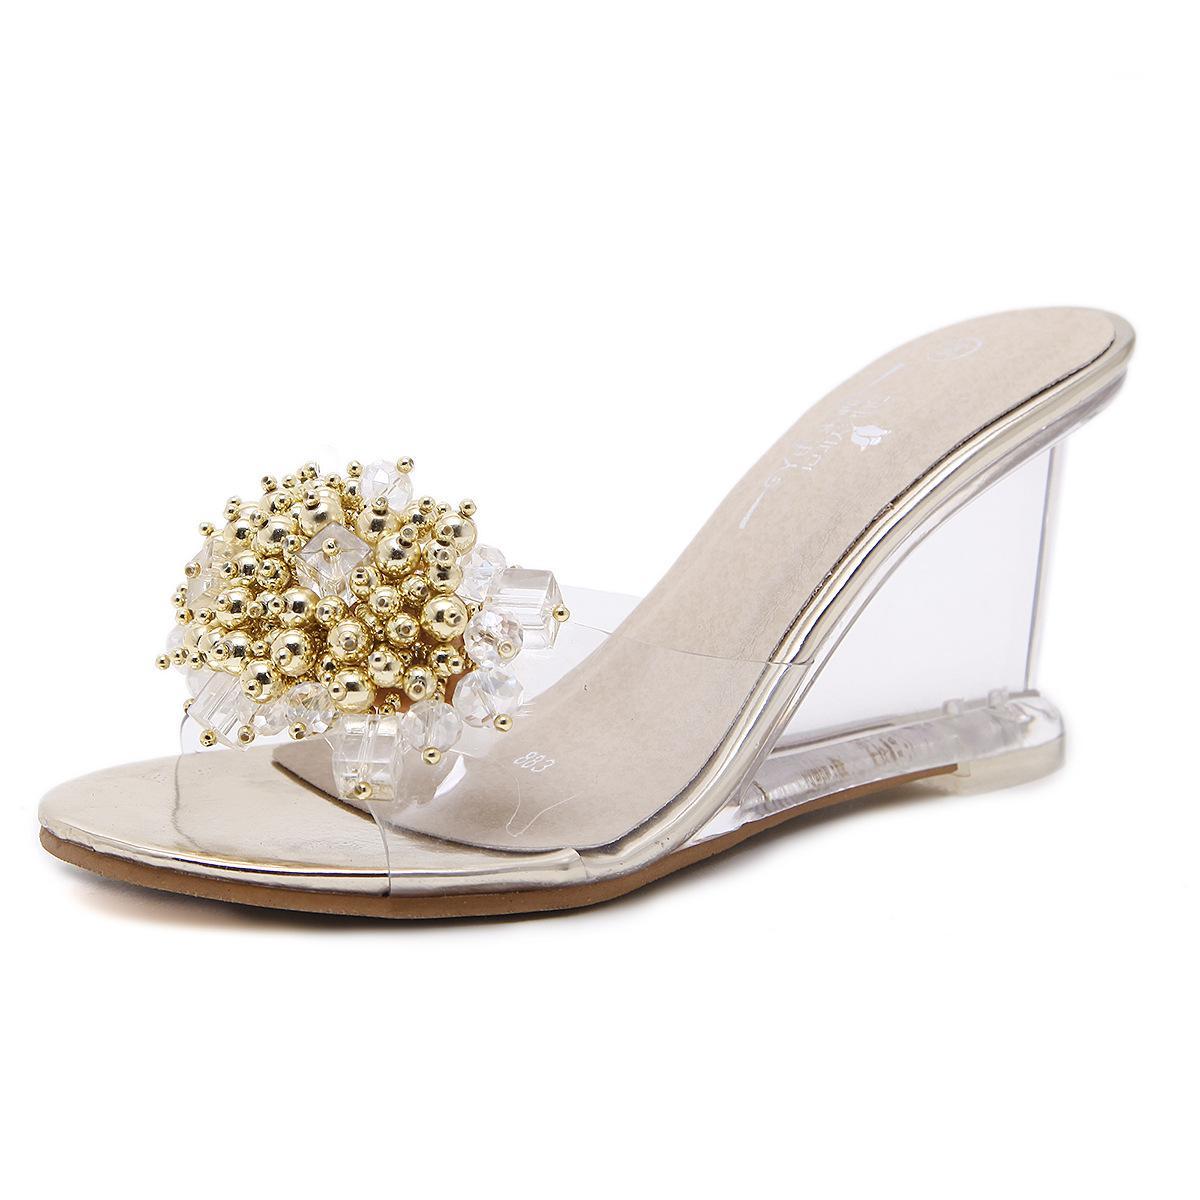 Crystal Women Sandals Sandalias Feminina 8.5cm High Heels Summer Women  Shoes Transparent Beads Sexy Girls Sandals Zapatos Mujer Tan Wedges Fringe  Sandals ... 2b492cd6171d